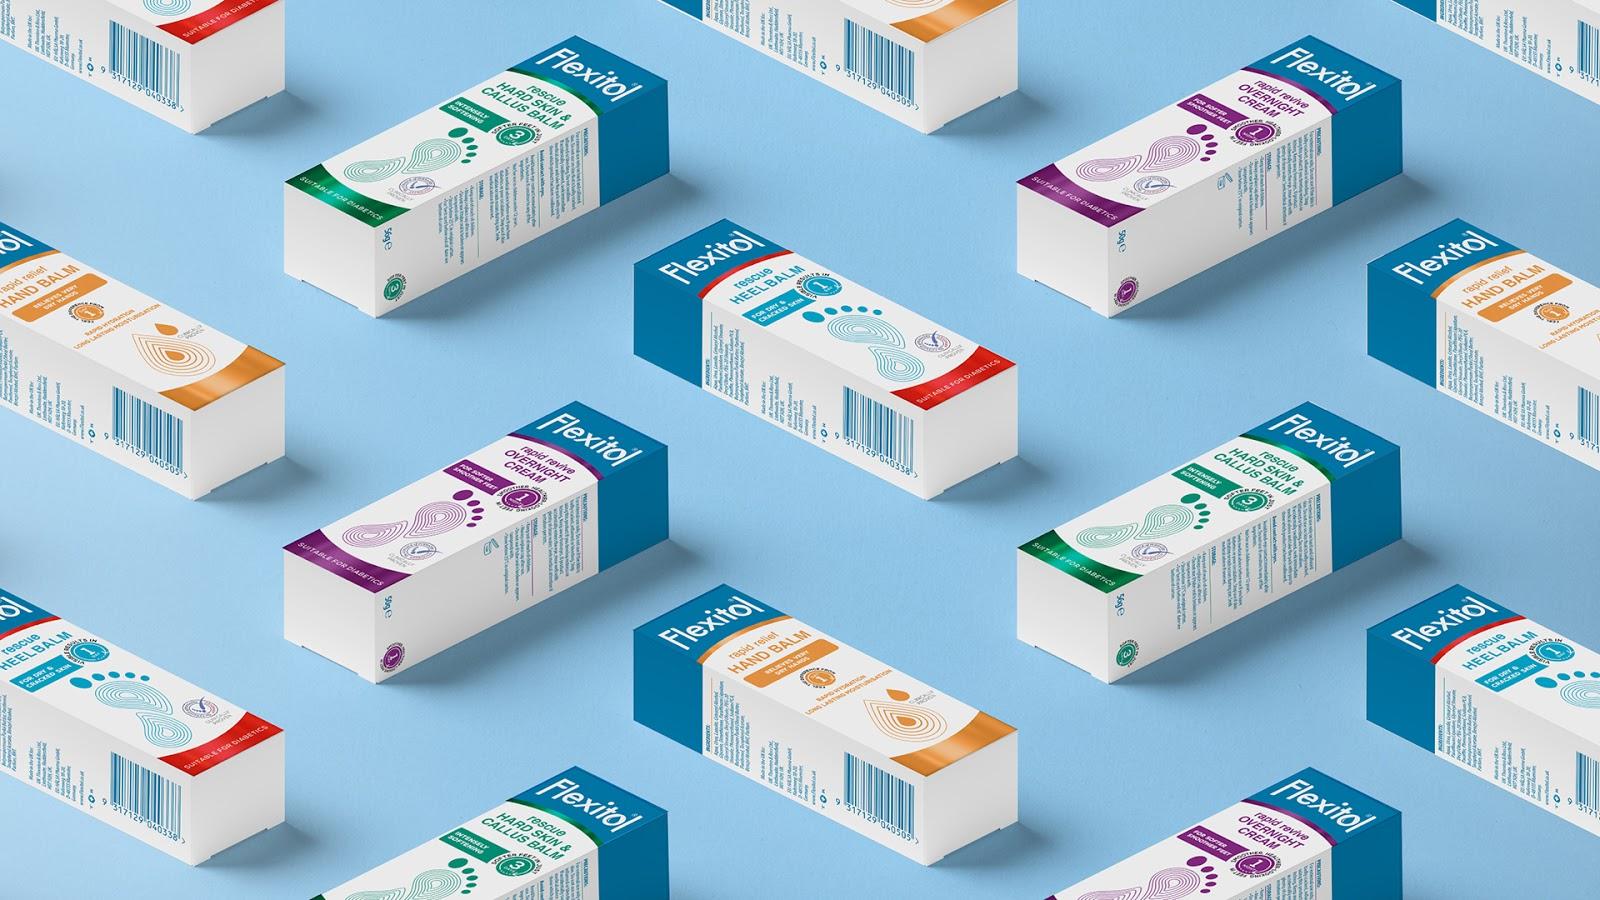 Flexitol brand repositioning